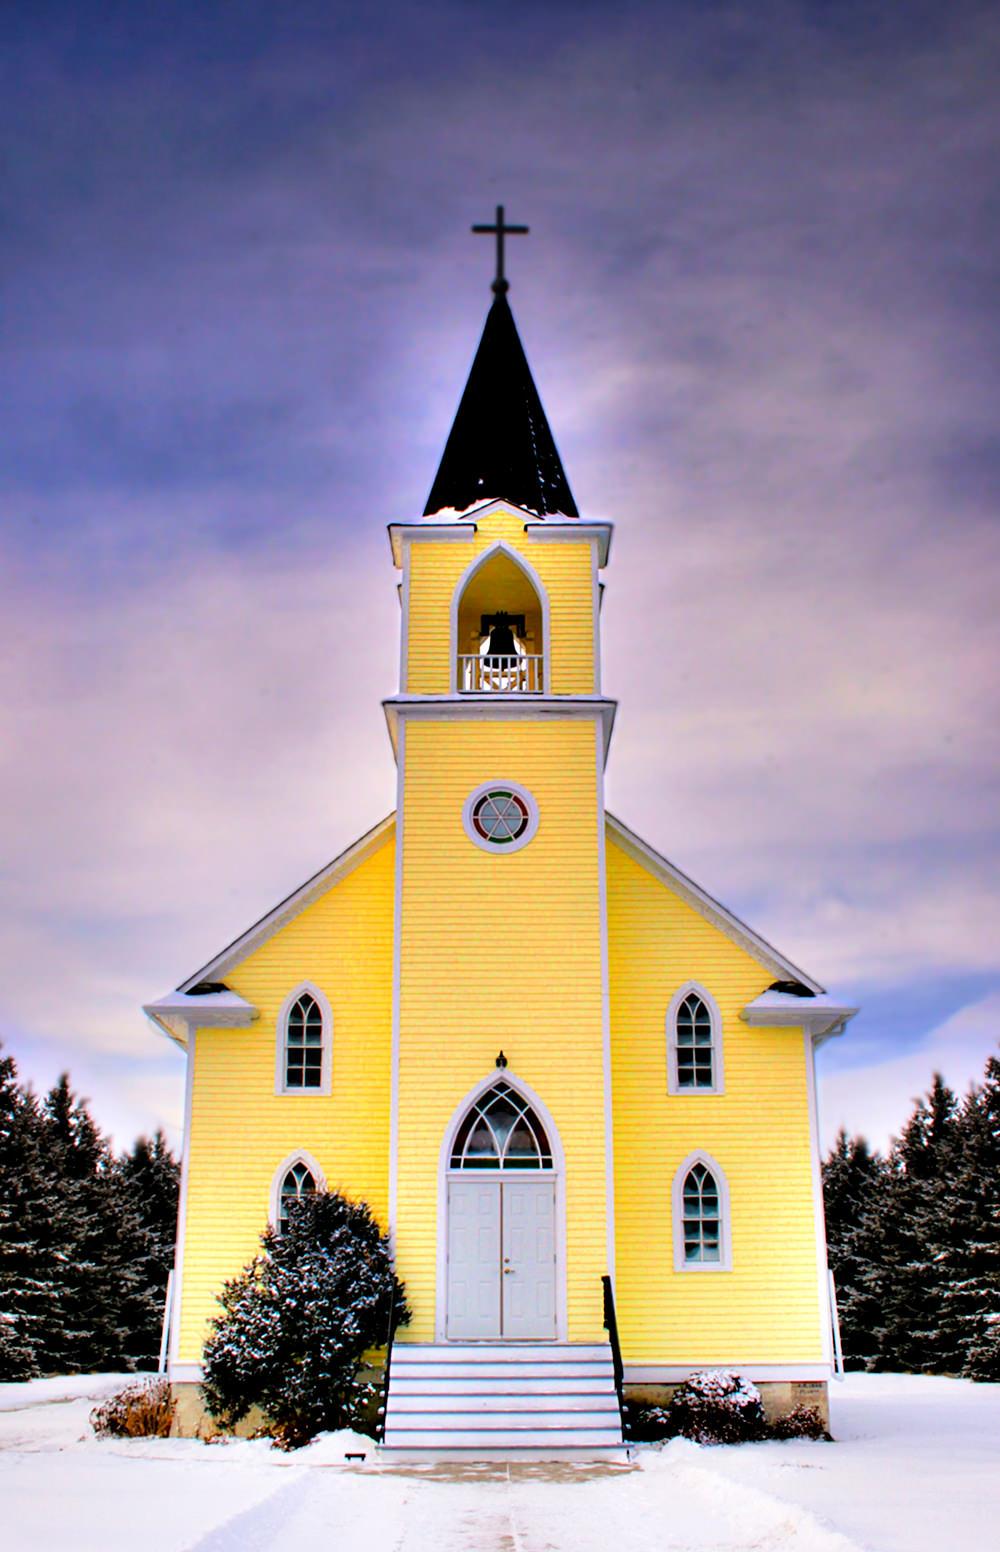 Foto gratis de iglesia